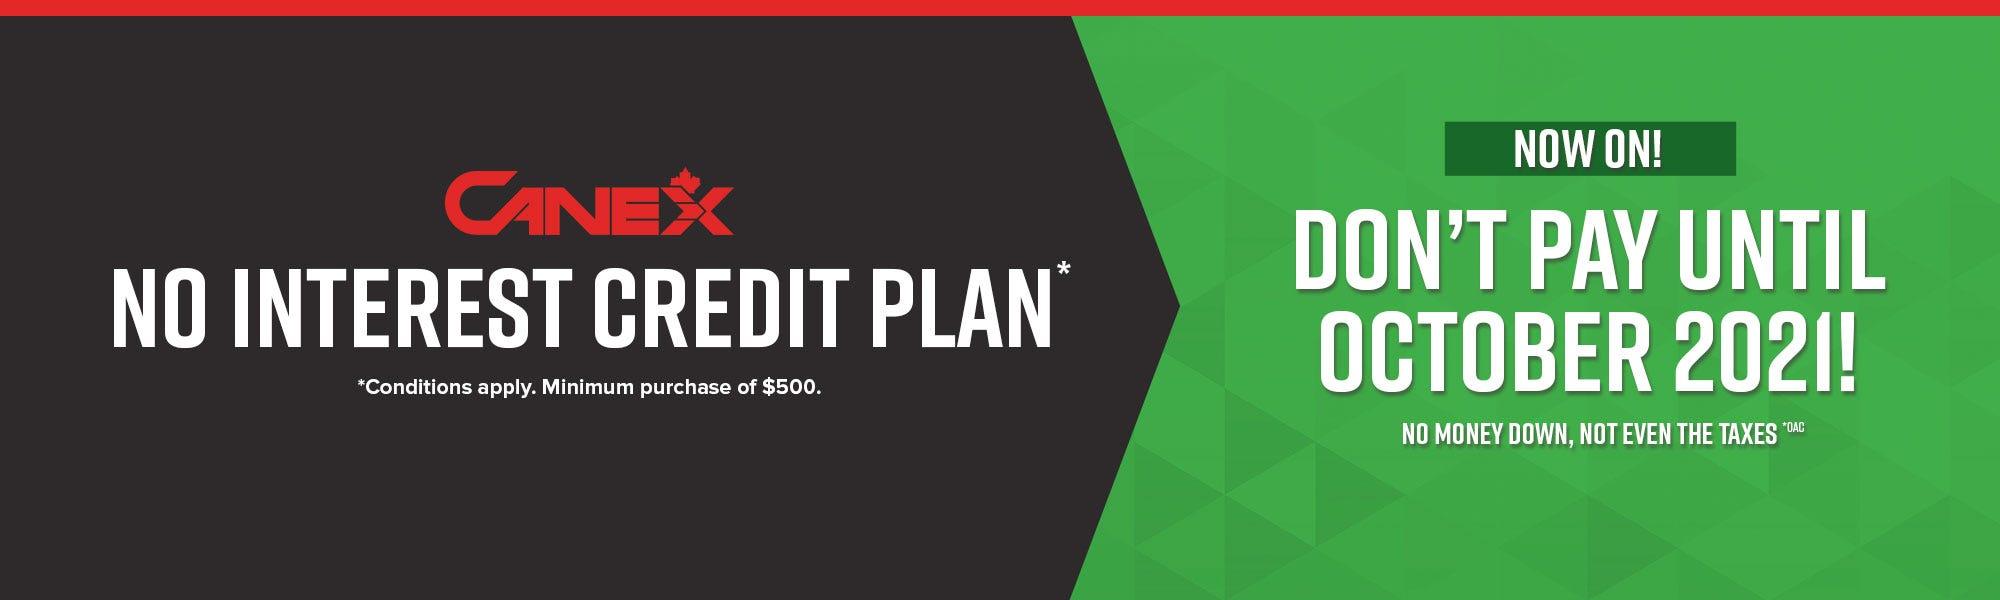 No Interest Credit Plan